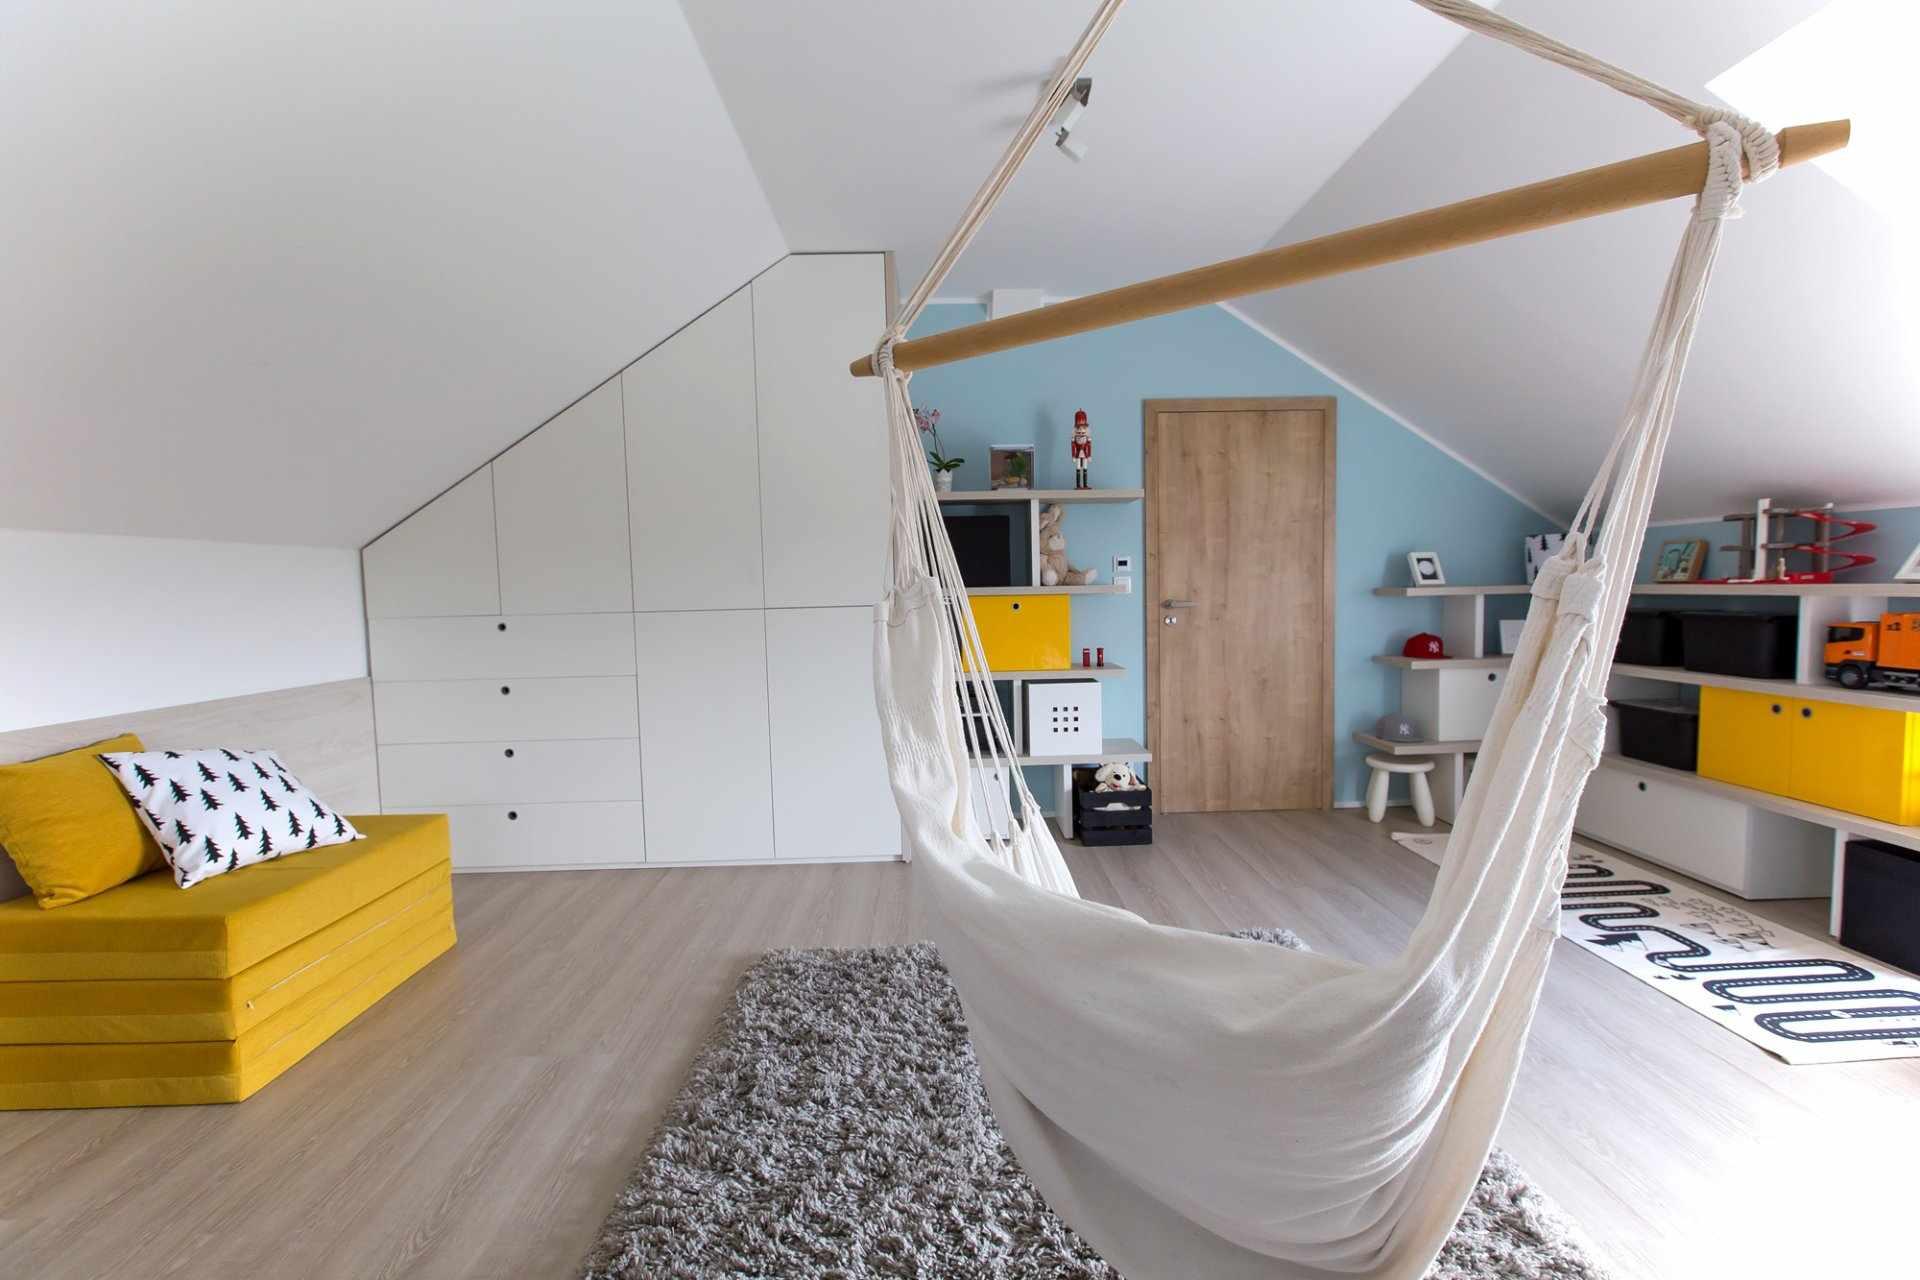 Светлая детская комната